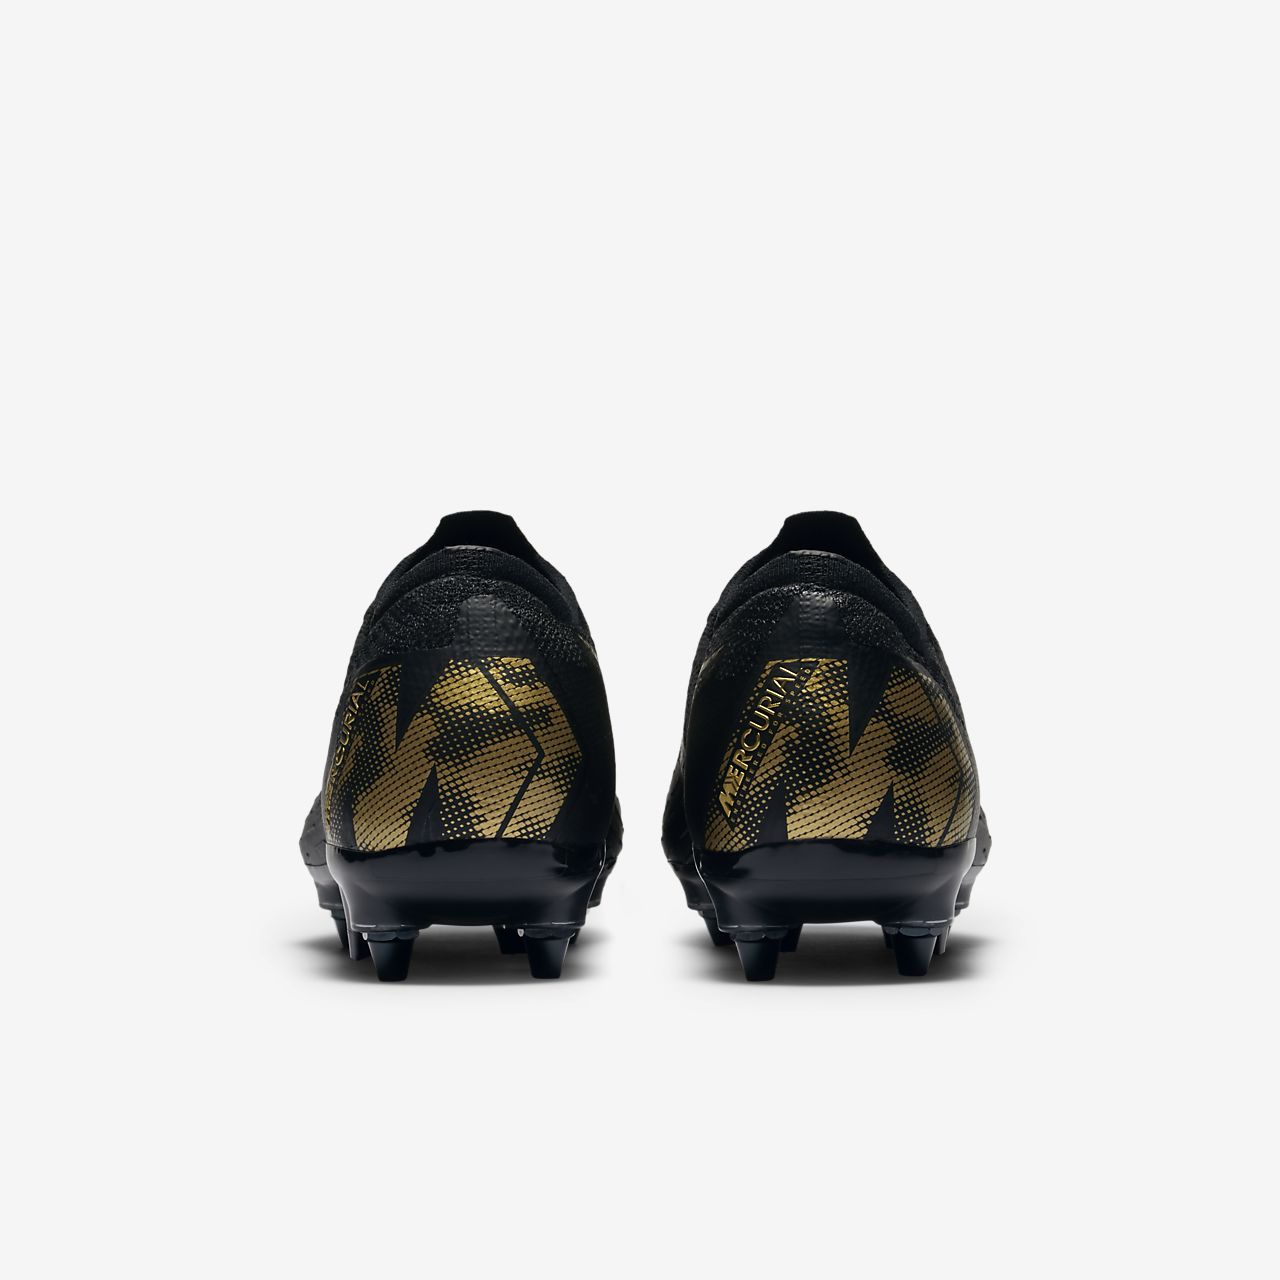 b2d6d462ce ... Chuteiras de futebol para terreno mole Nike Mercurial Vapor 360 Elite  SG-PRO Anti-